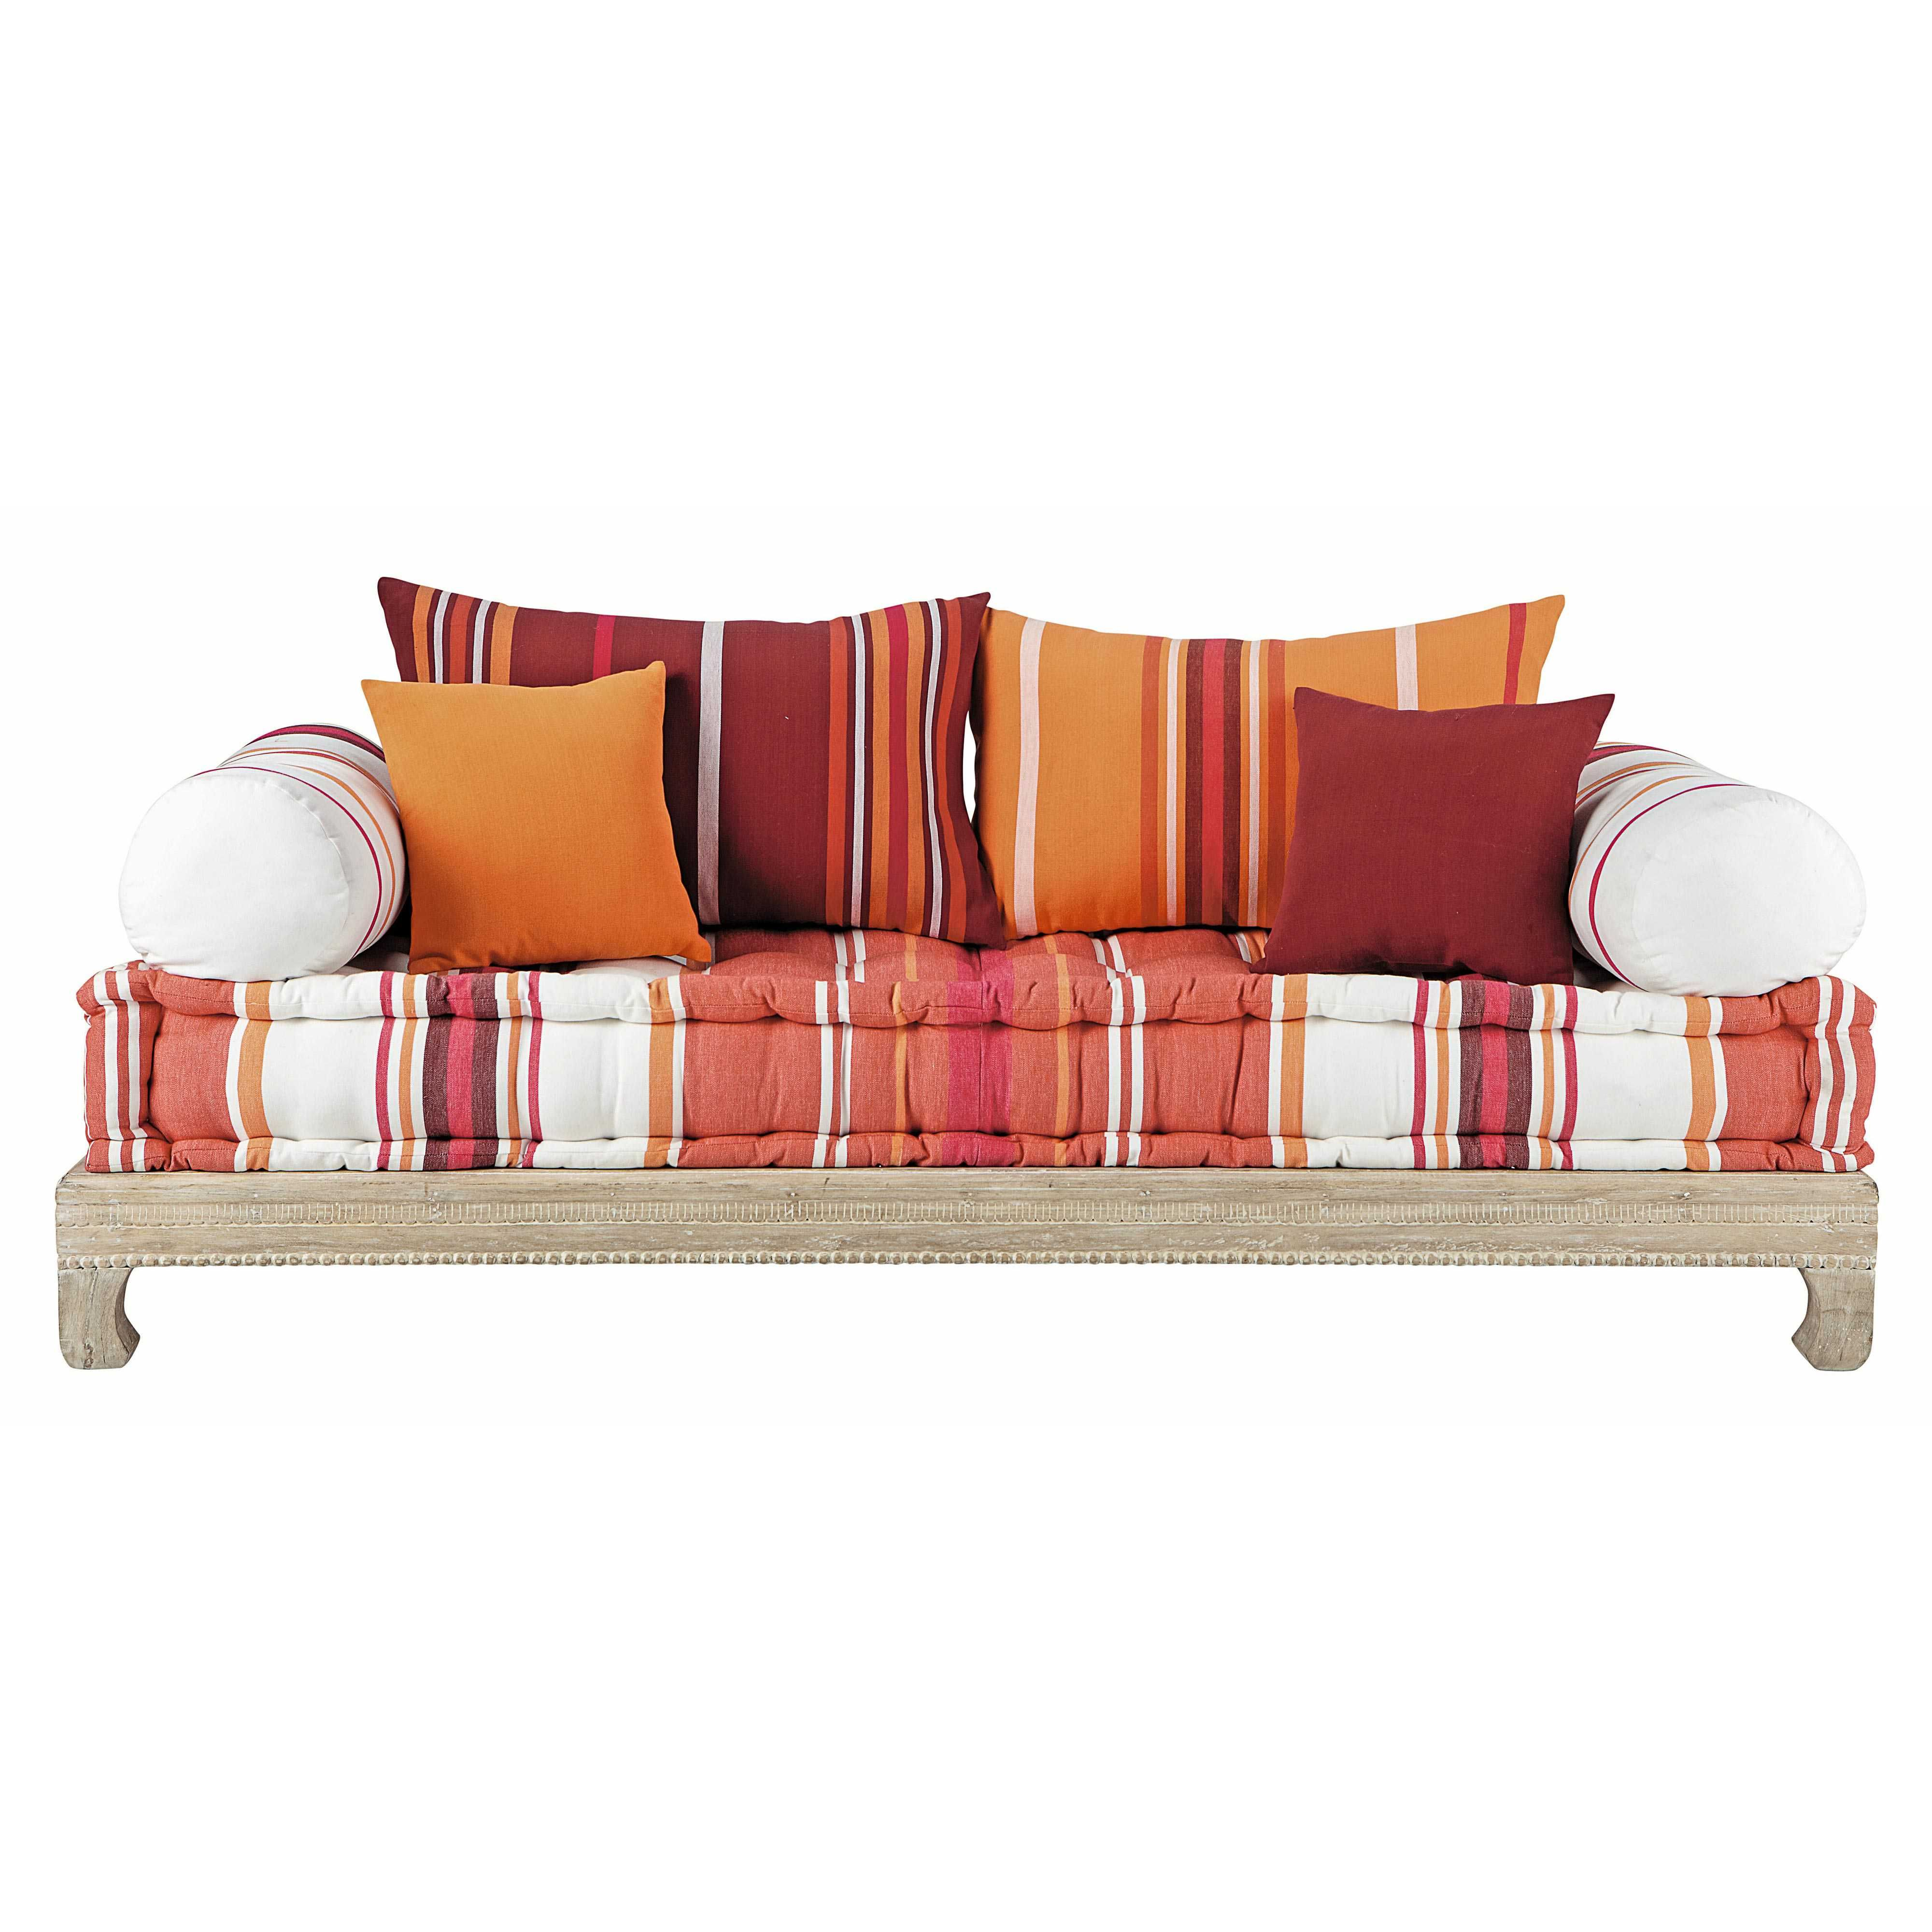 2 Seater Cotton Day Bed, Multicoloured Boheme